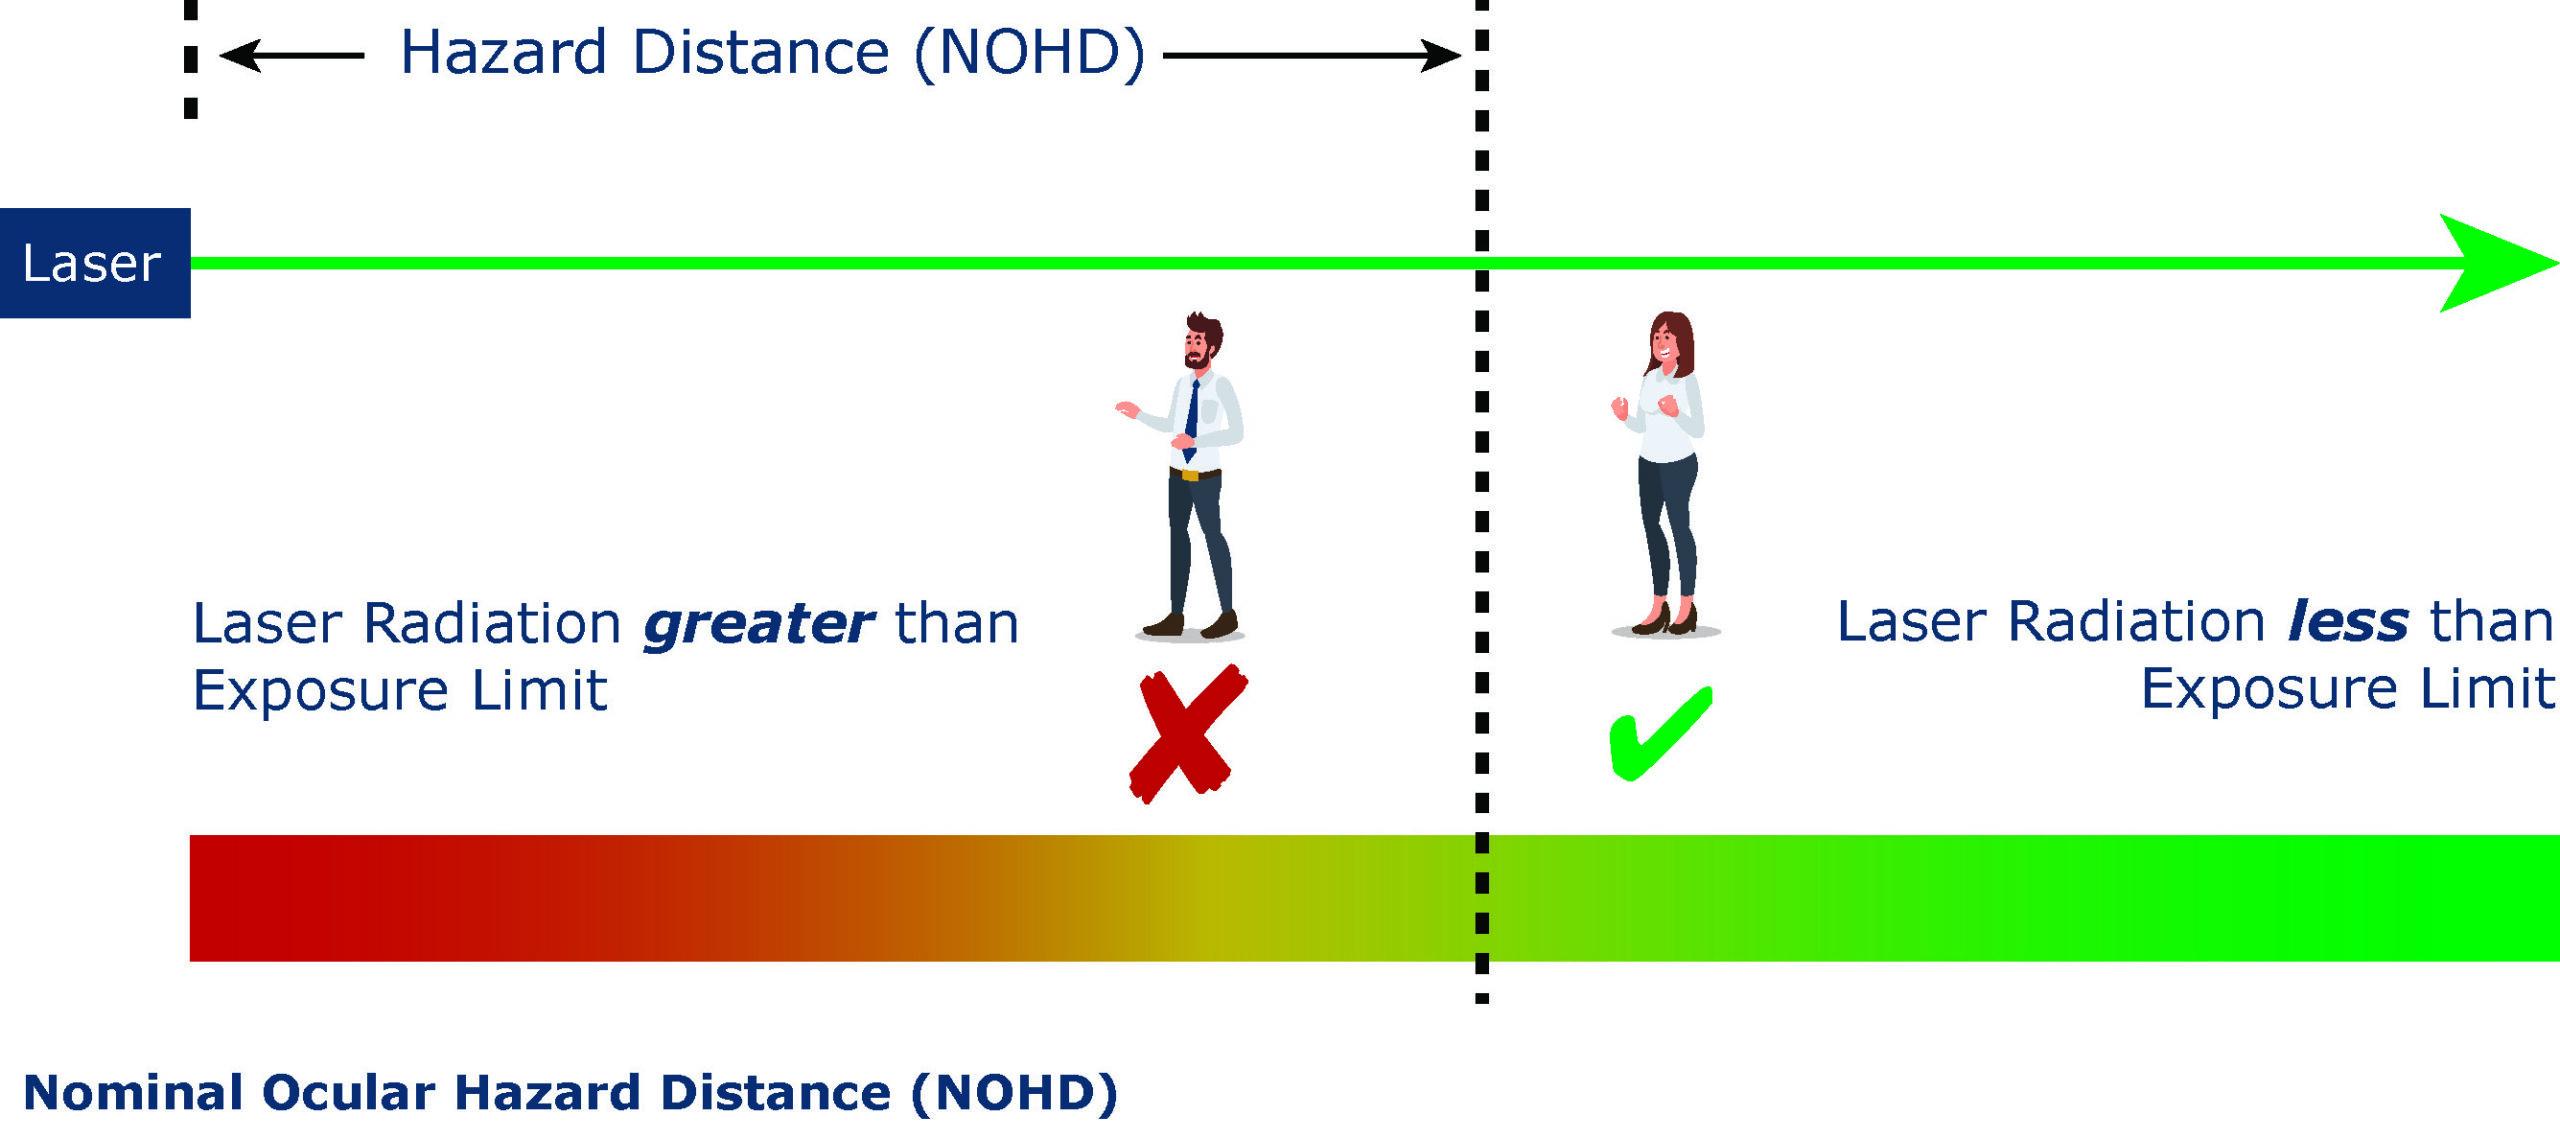 Nominal Ocular Hazard Distance diagram